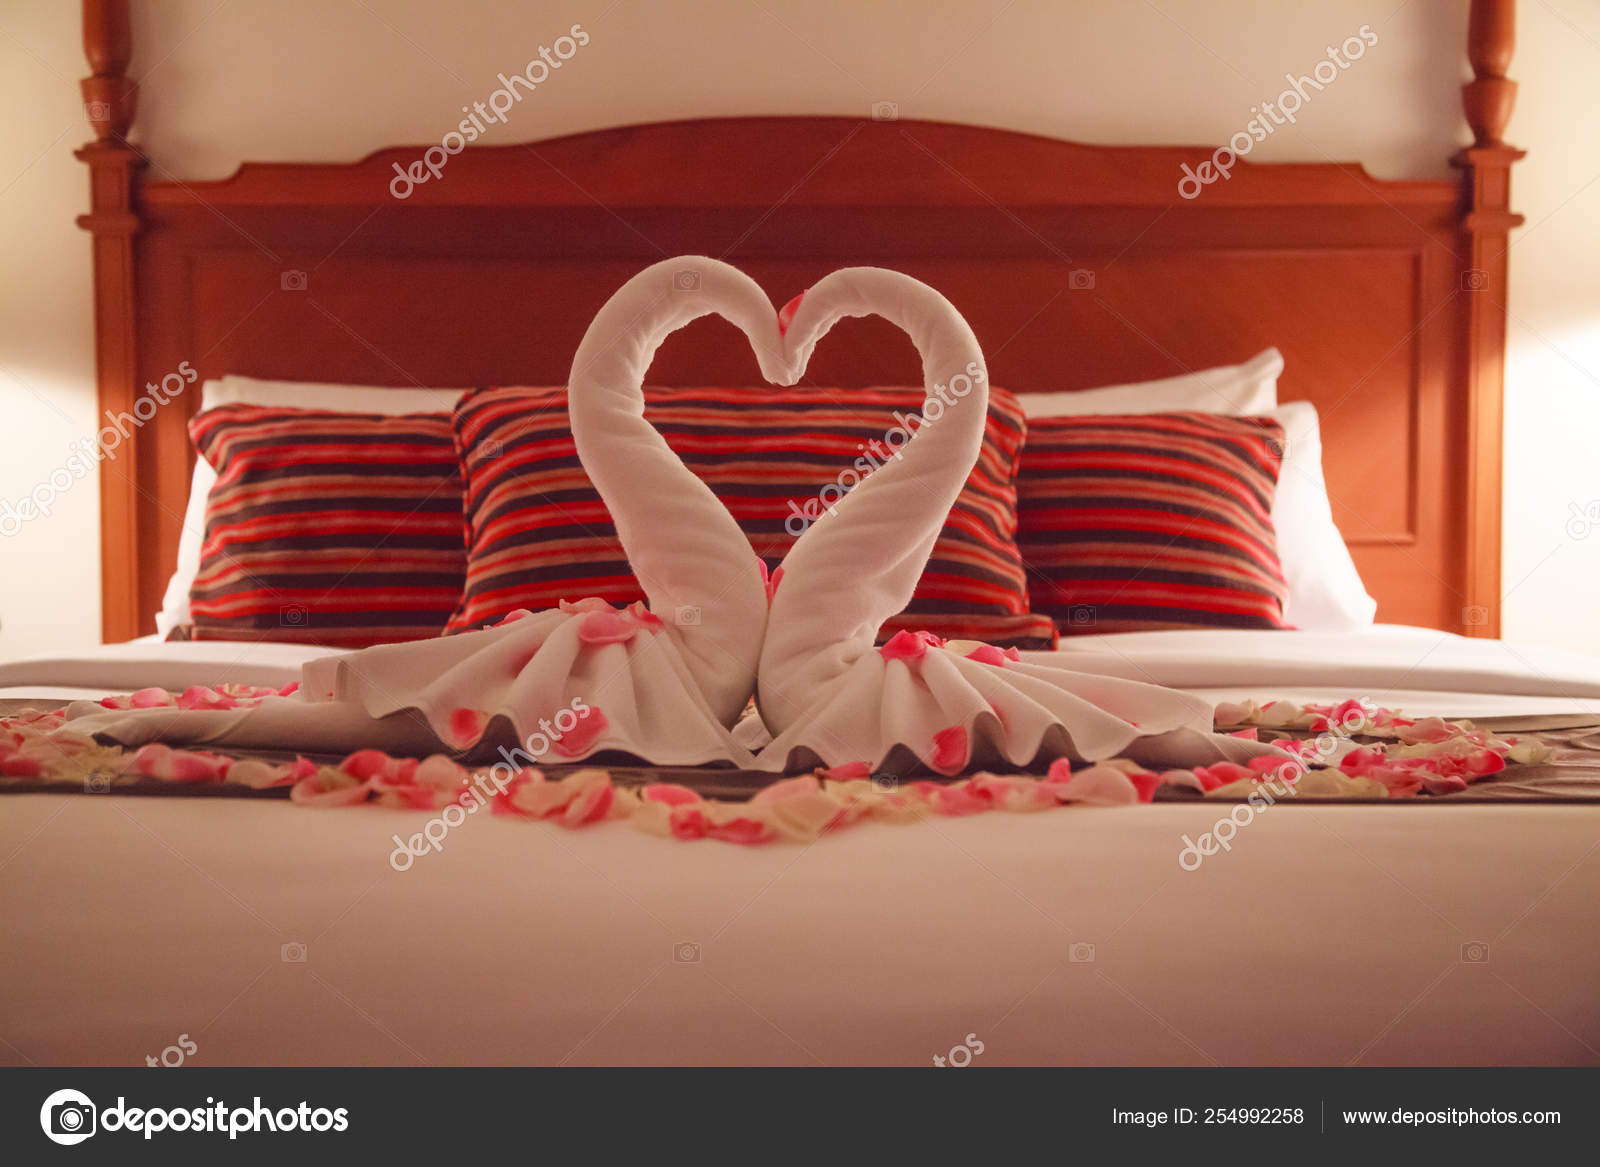 Photo Kissing Swan Towels Romantic Bedroom Interior Kissing Swan Origami Towels Sprinkled Fresh Pink Stock Photo C Victorflowerfly 254992258